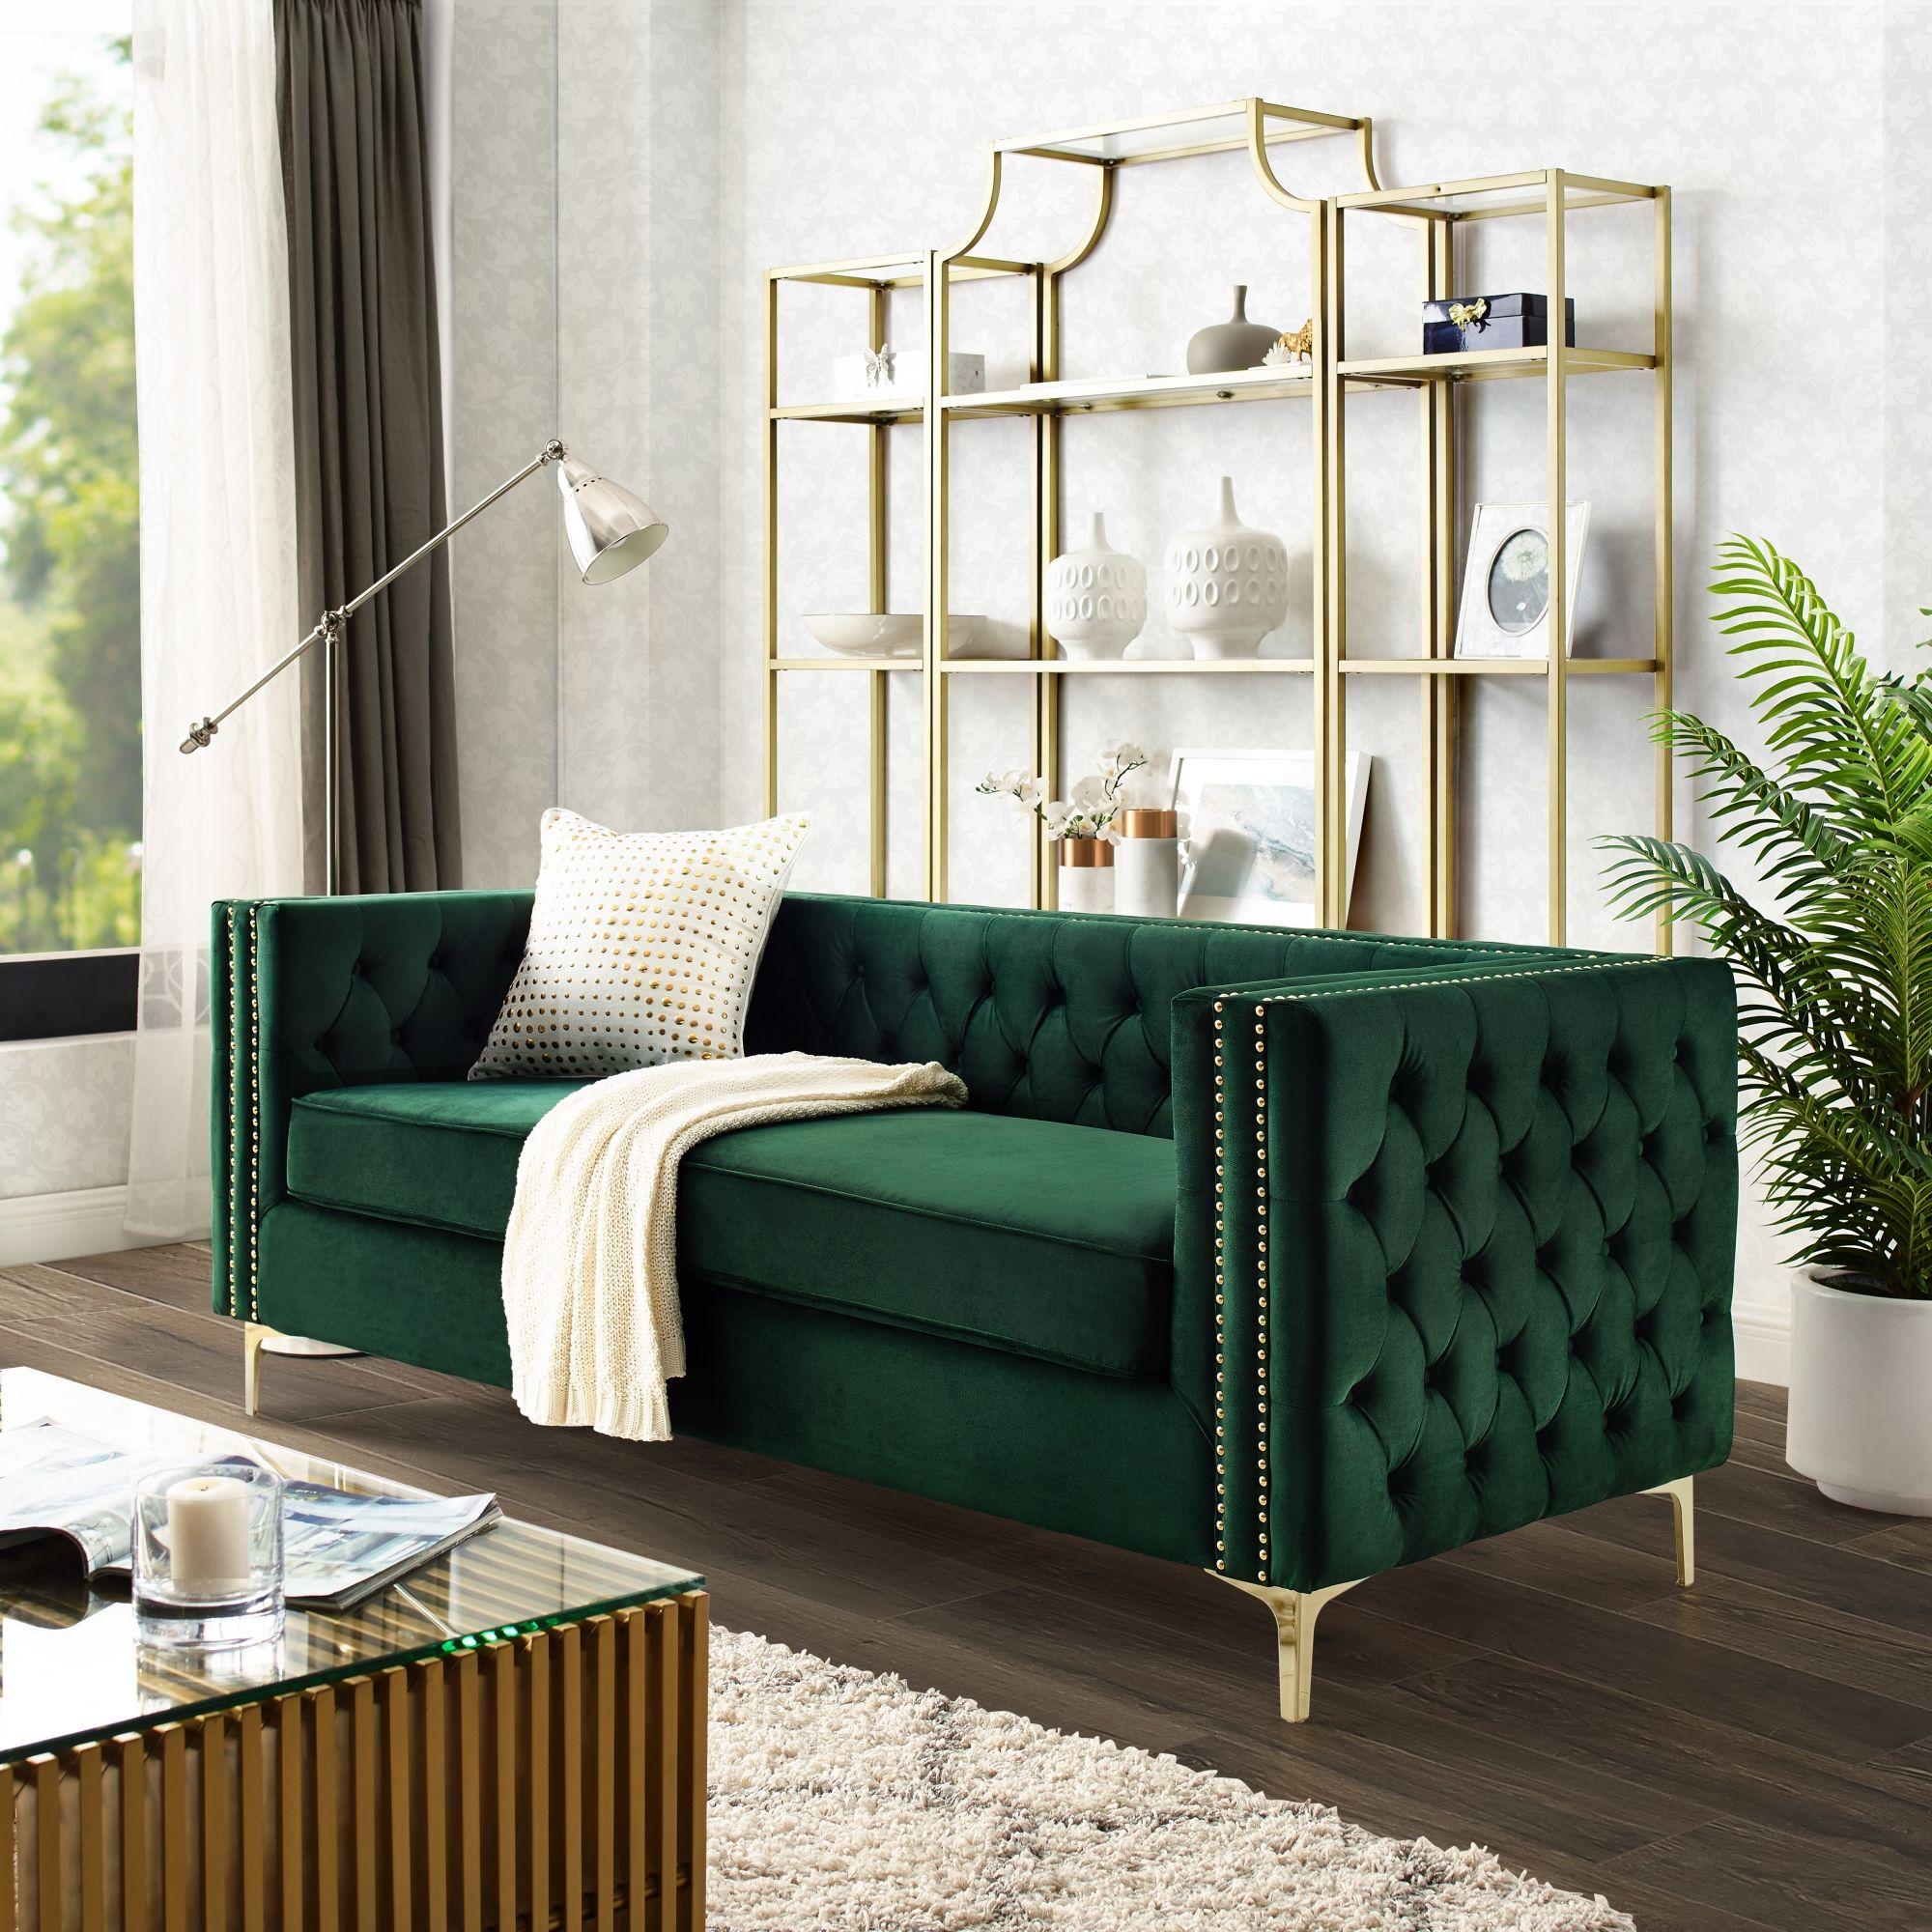 Inspired home sania velvet sofa 3seat nailhead trim gold